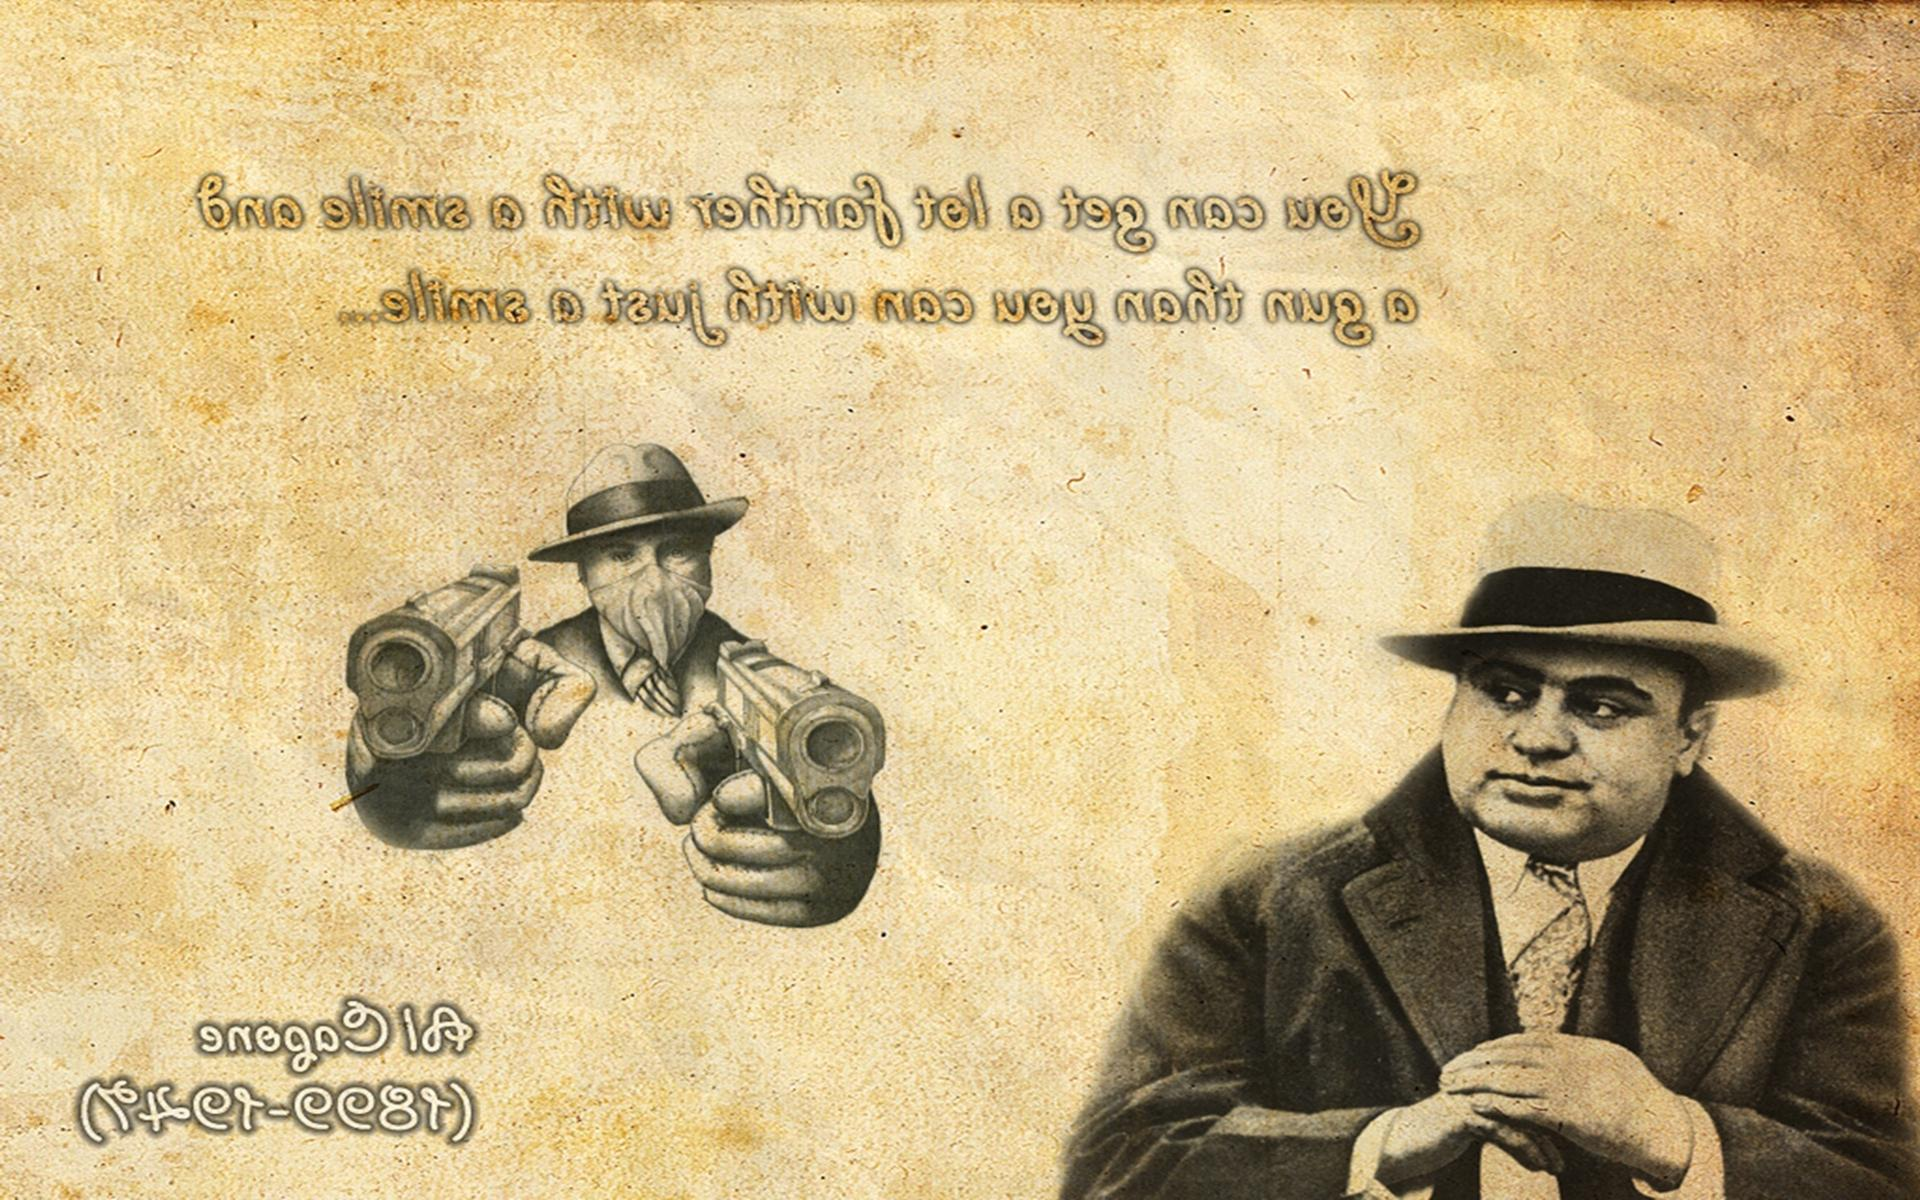 Al Capone Wallpapers